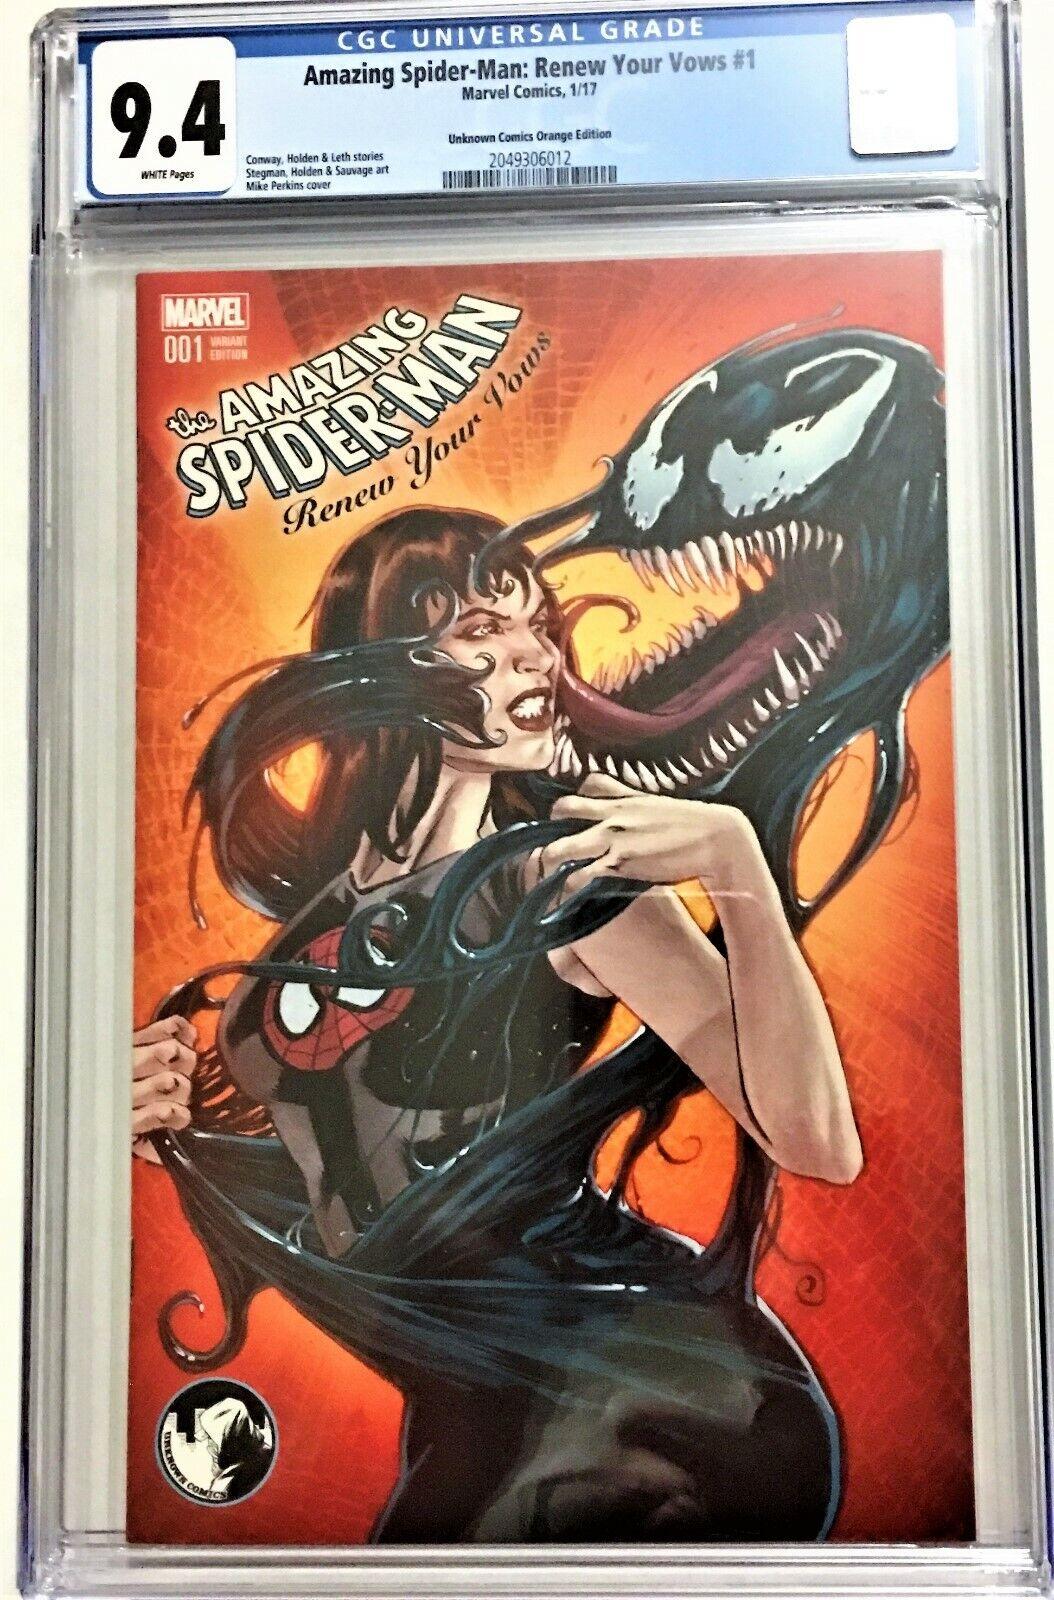 Amazing Spider-Man Renew Your Vows #5 Venomized Variant  Marvel Comics CB17151